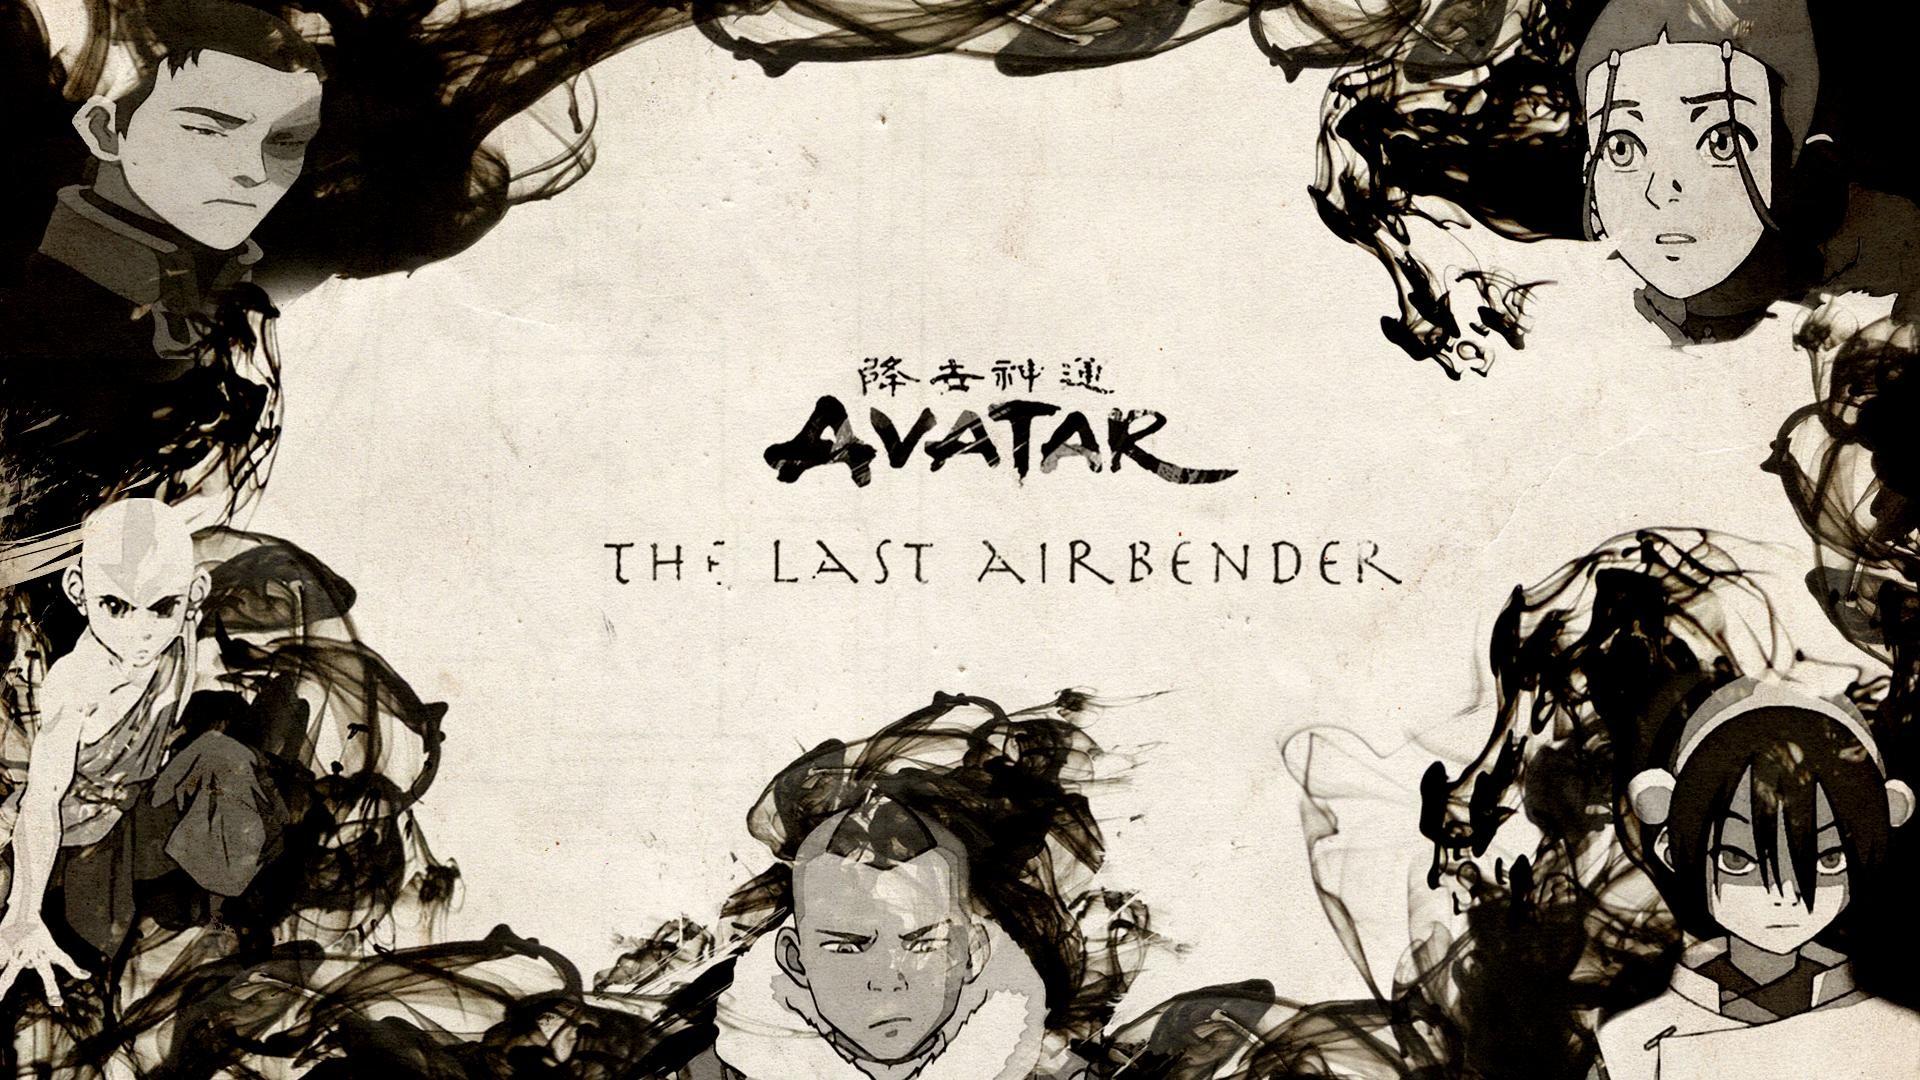 44 443887 avatar the last airbender wallpaper avatar the last